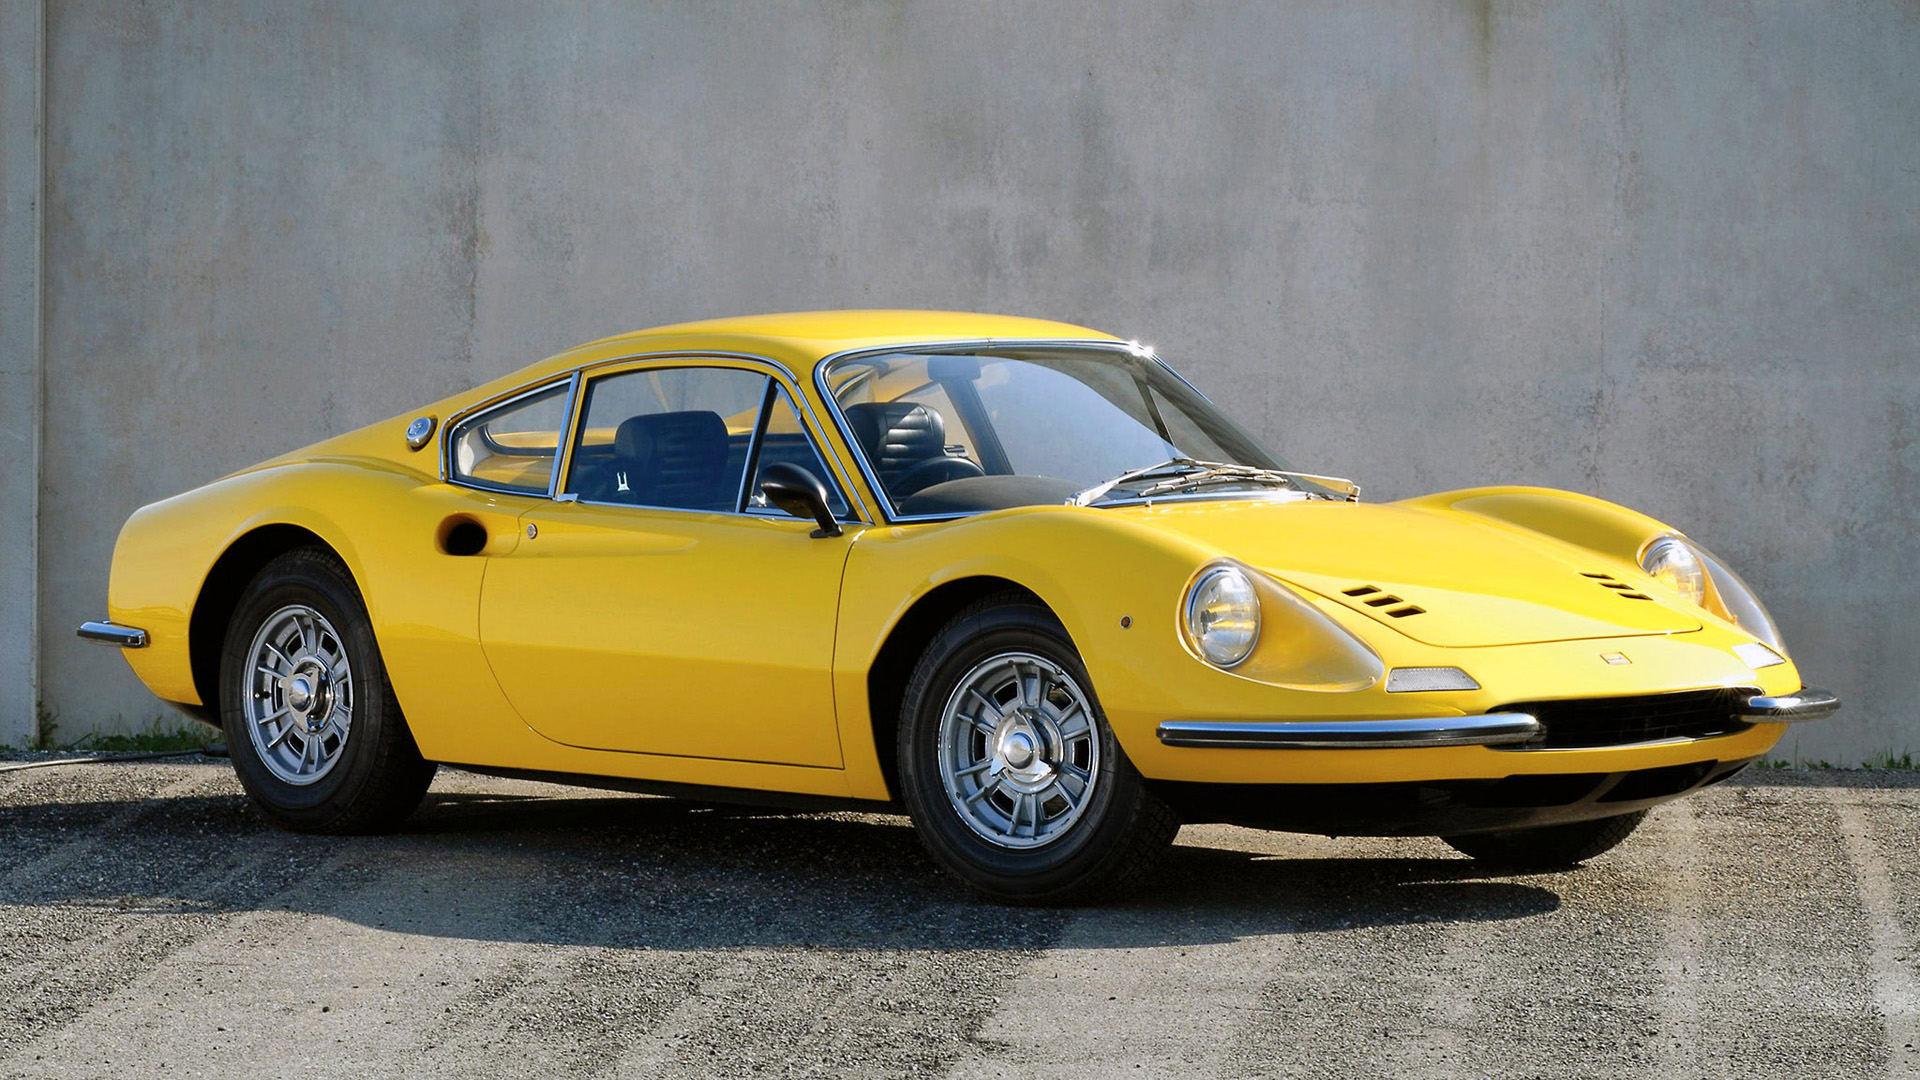 1966 Ferrari Dino 206 GT